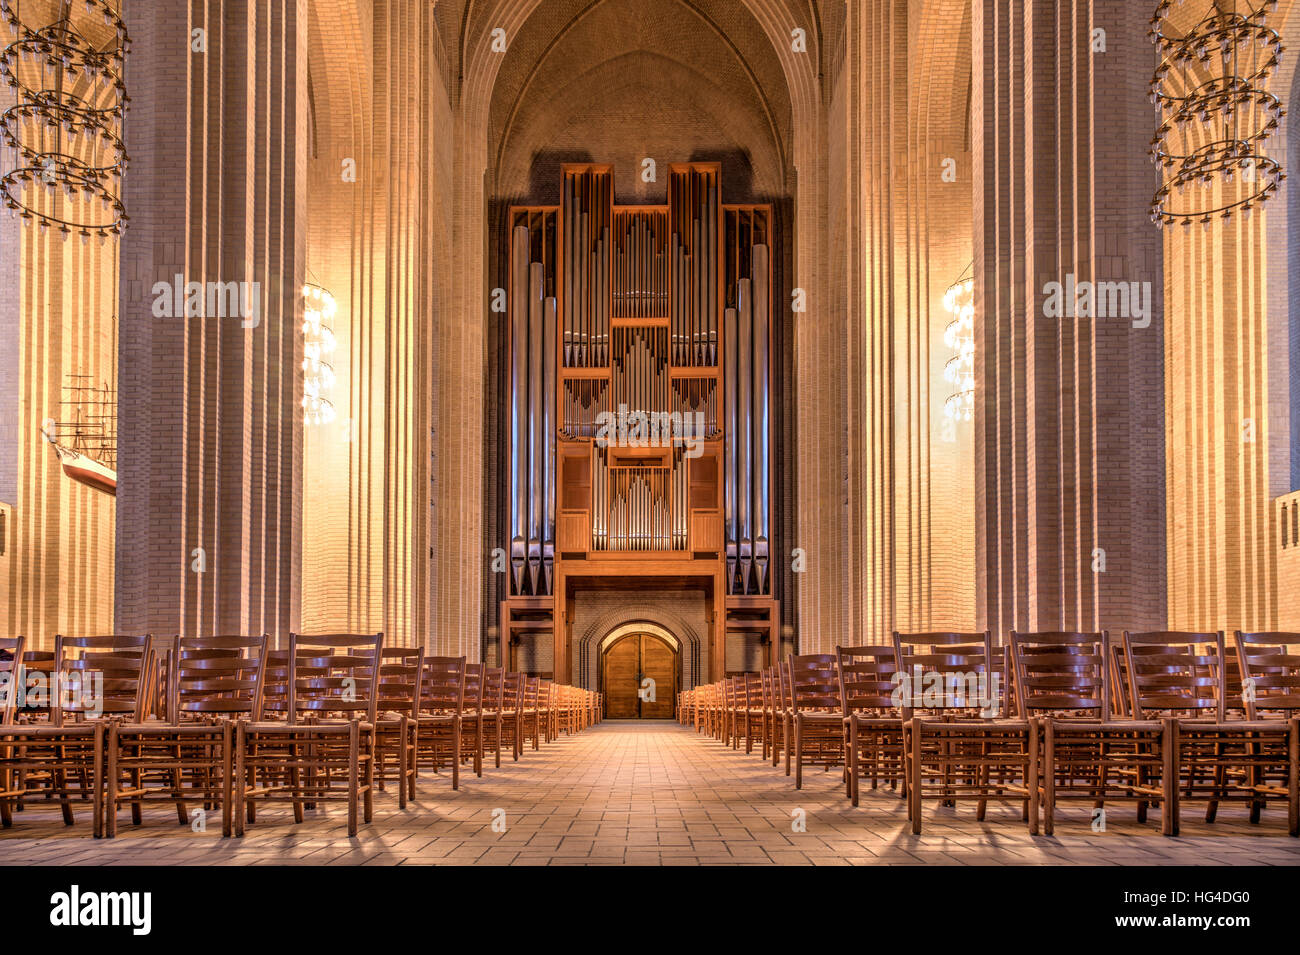 Copenhagen, Denmark - January 03, 2017: Interior photography of Grundtvigs Church with its pipe organ - Stock Image